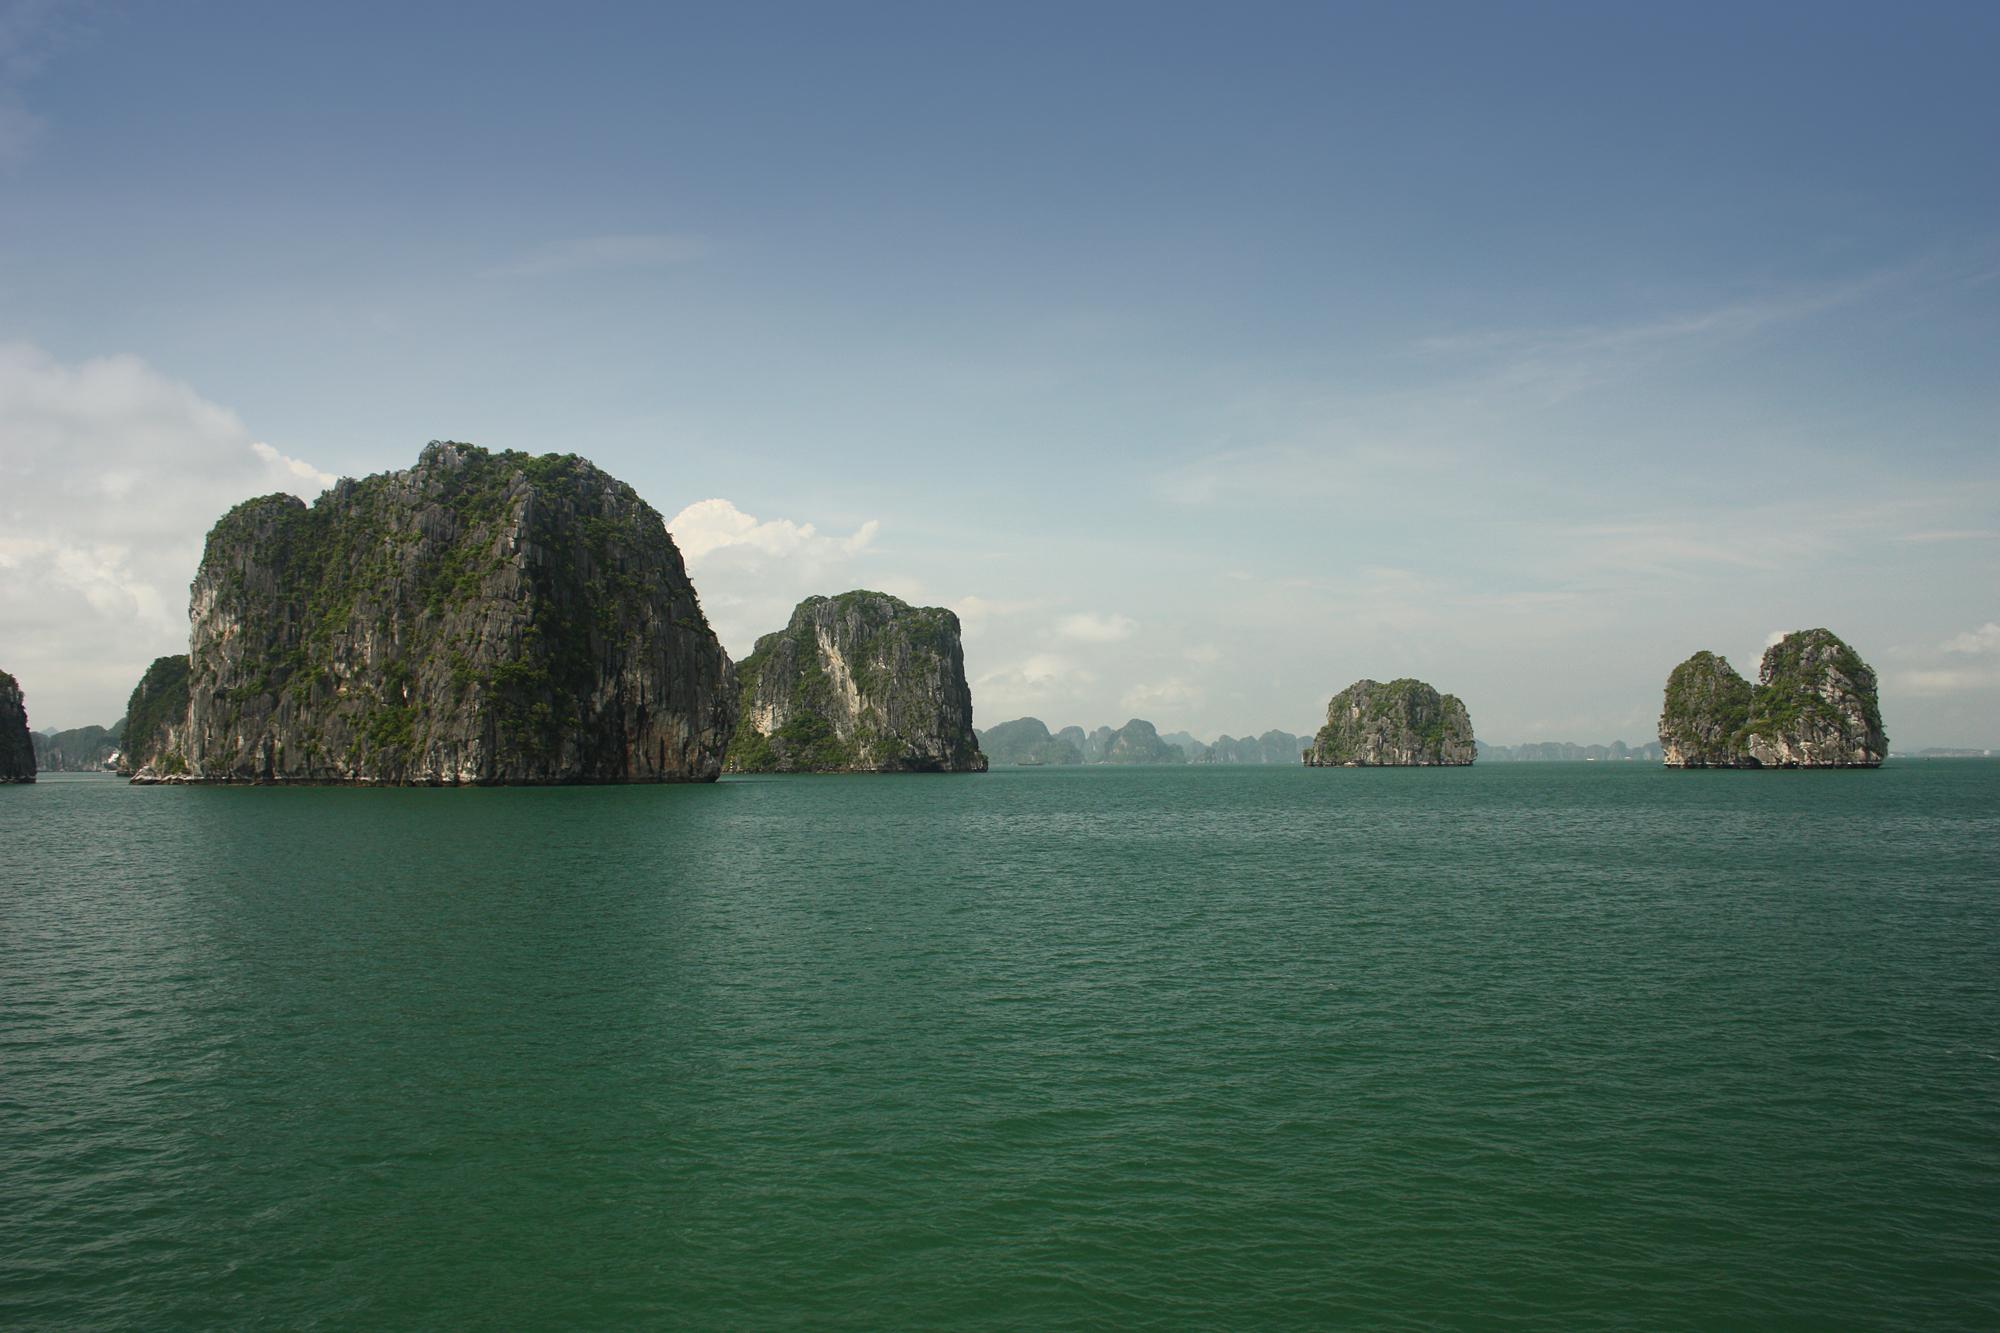 Ha Long Bay, obyek wisata di Vietnam yang sudah terkenal hingga dunia internasional.